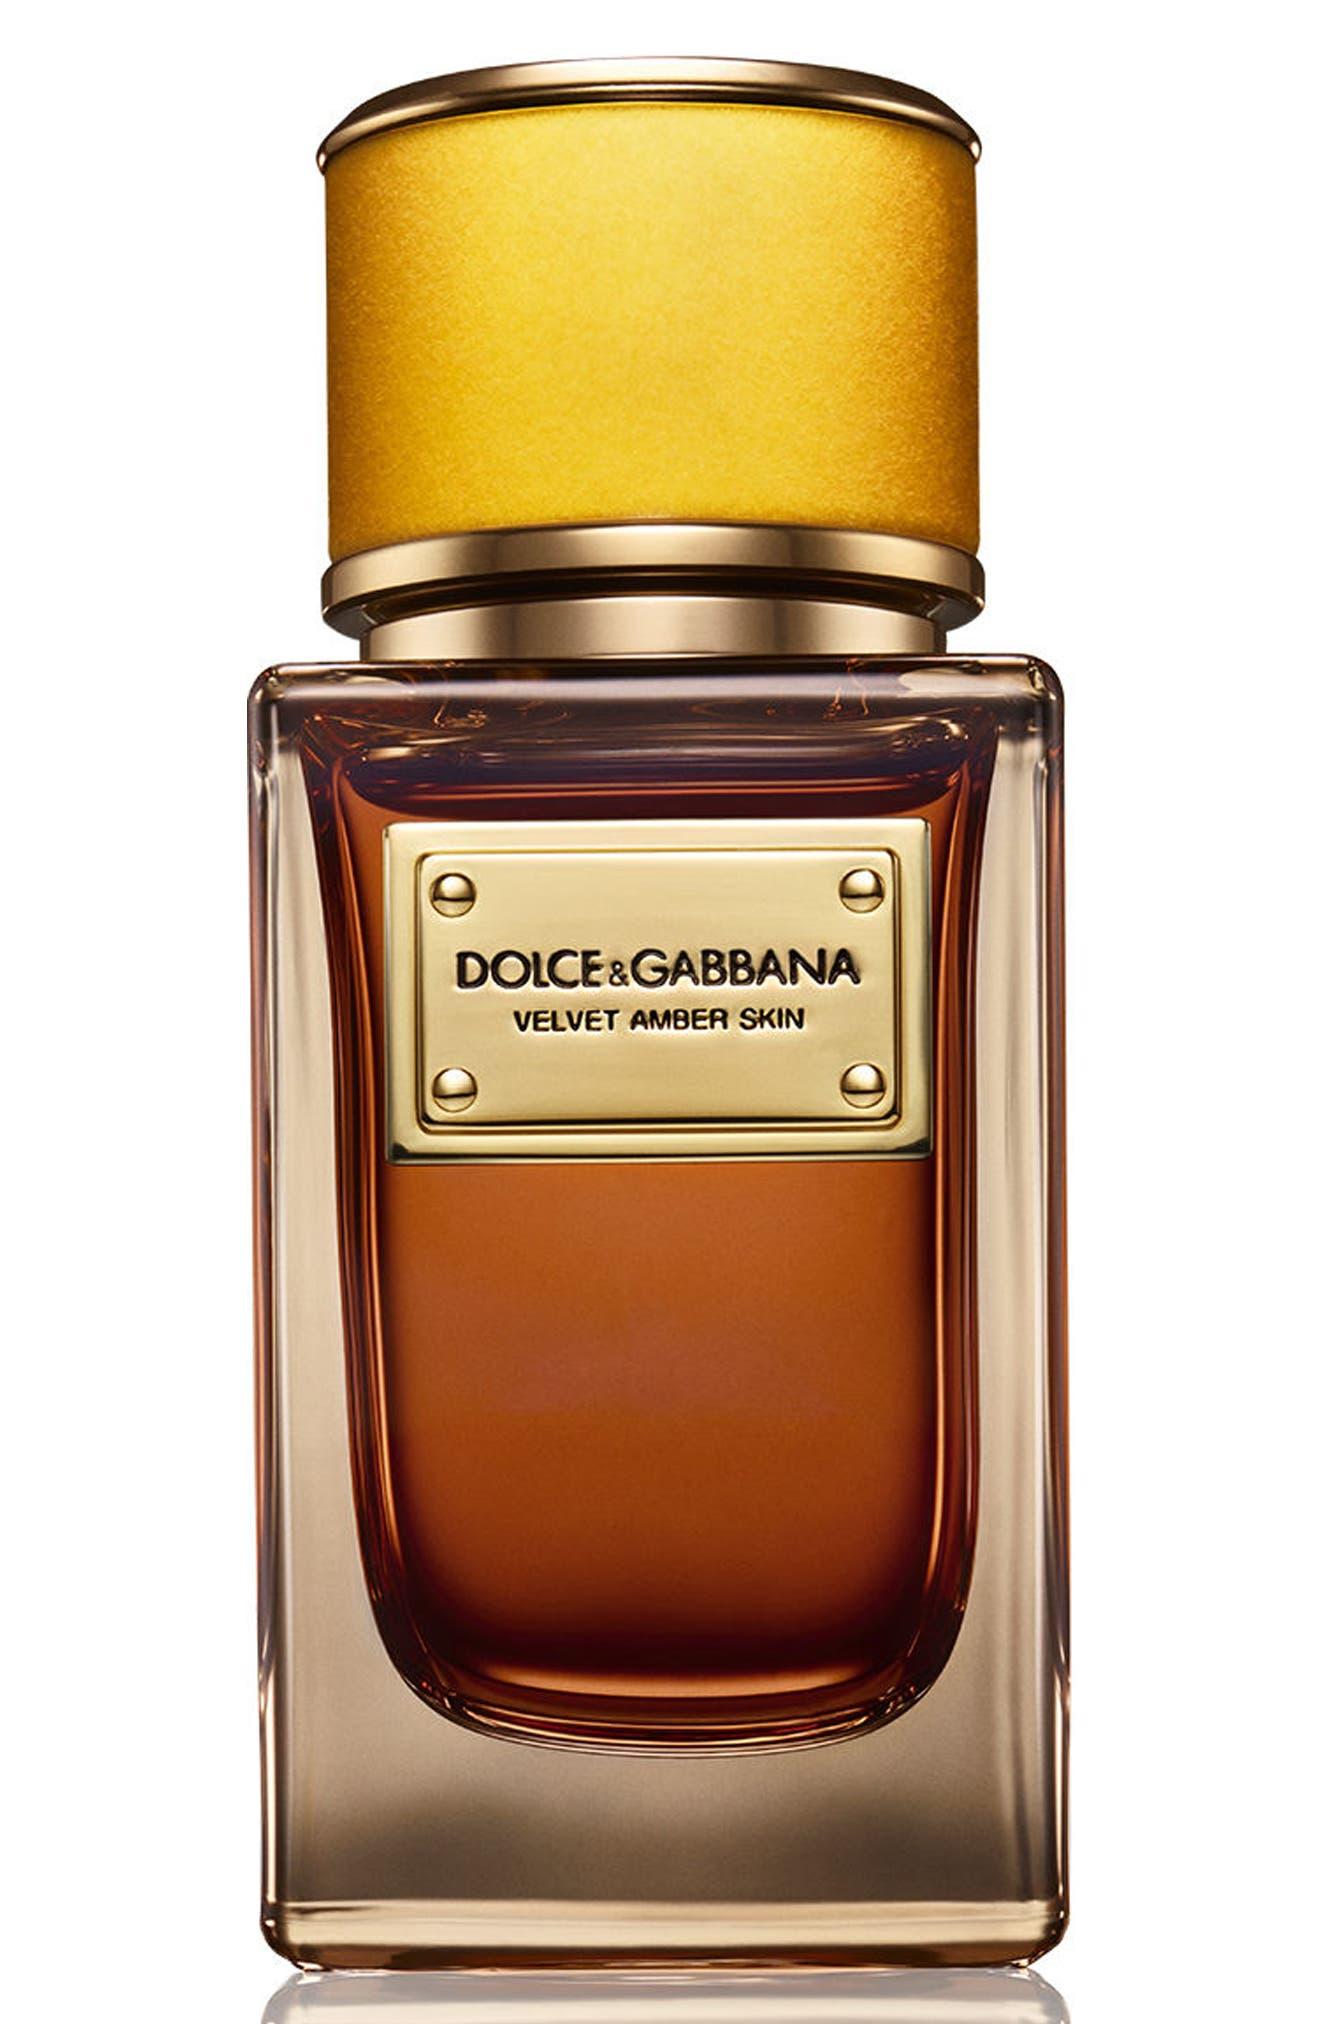 Main Image - Dolce&Gabbana Velvet Amber Skin Eau de Parfum